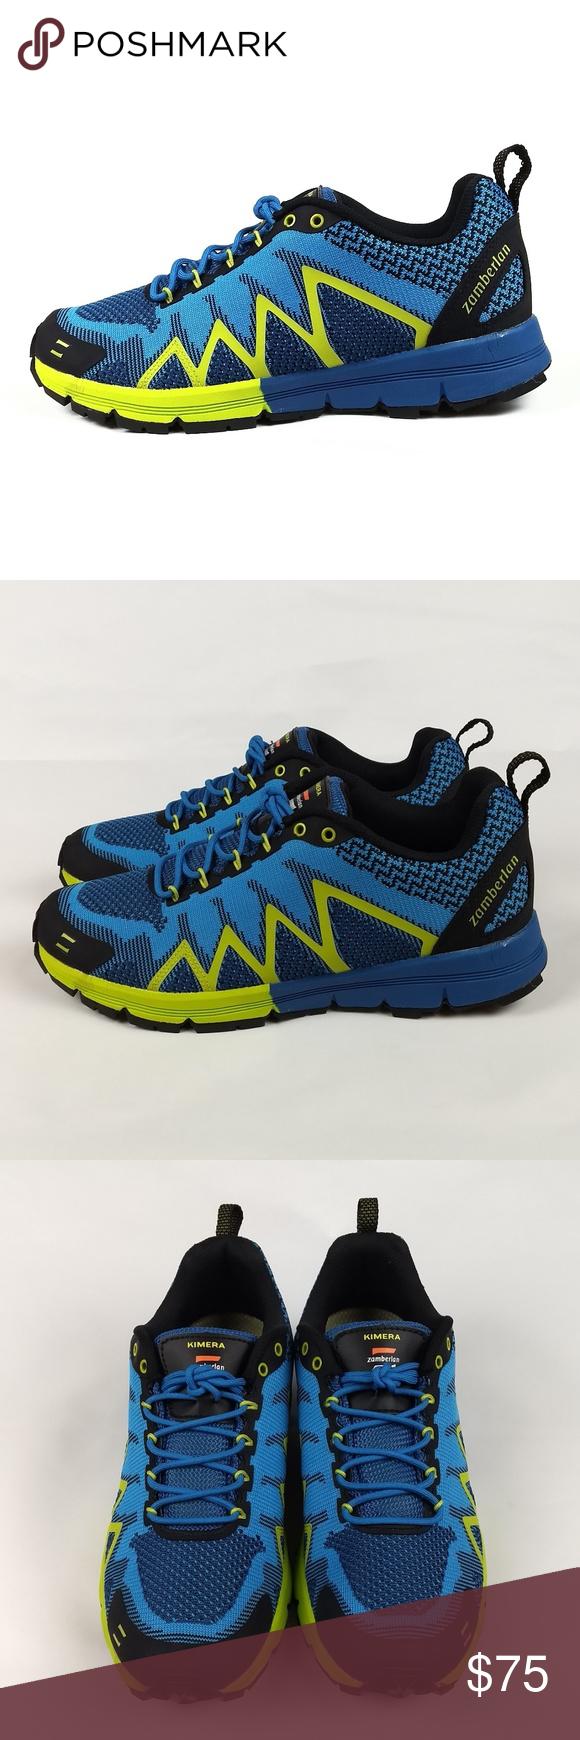 Zamberlan Kimera RR Hiking Shoes EUR 41